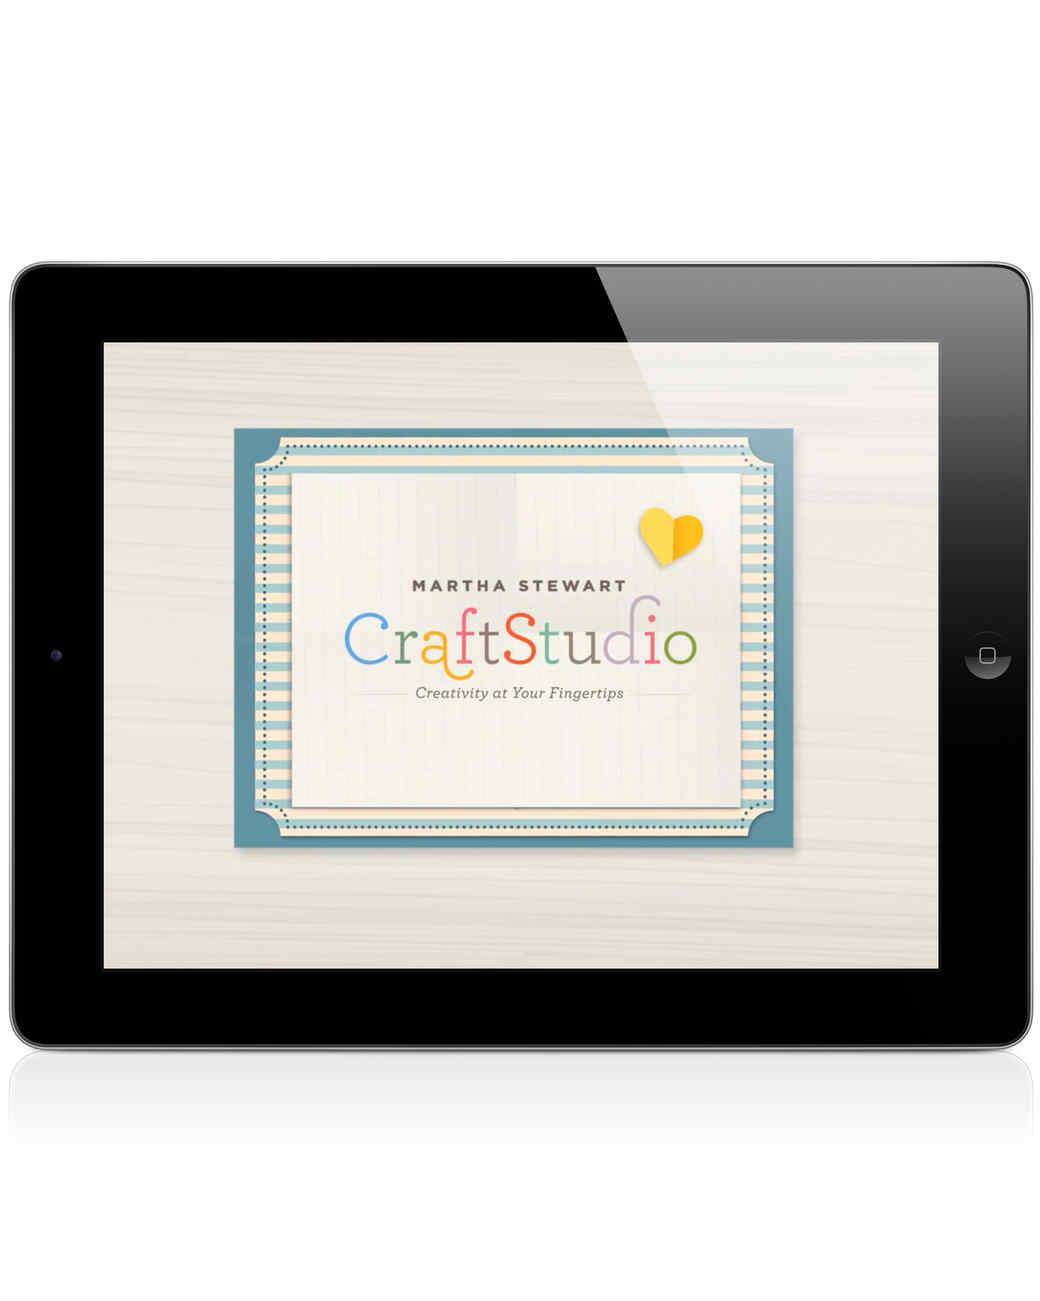 craftstudio-app-msl-0.jpg